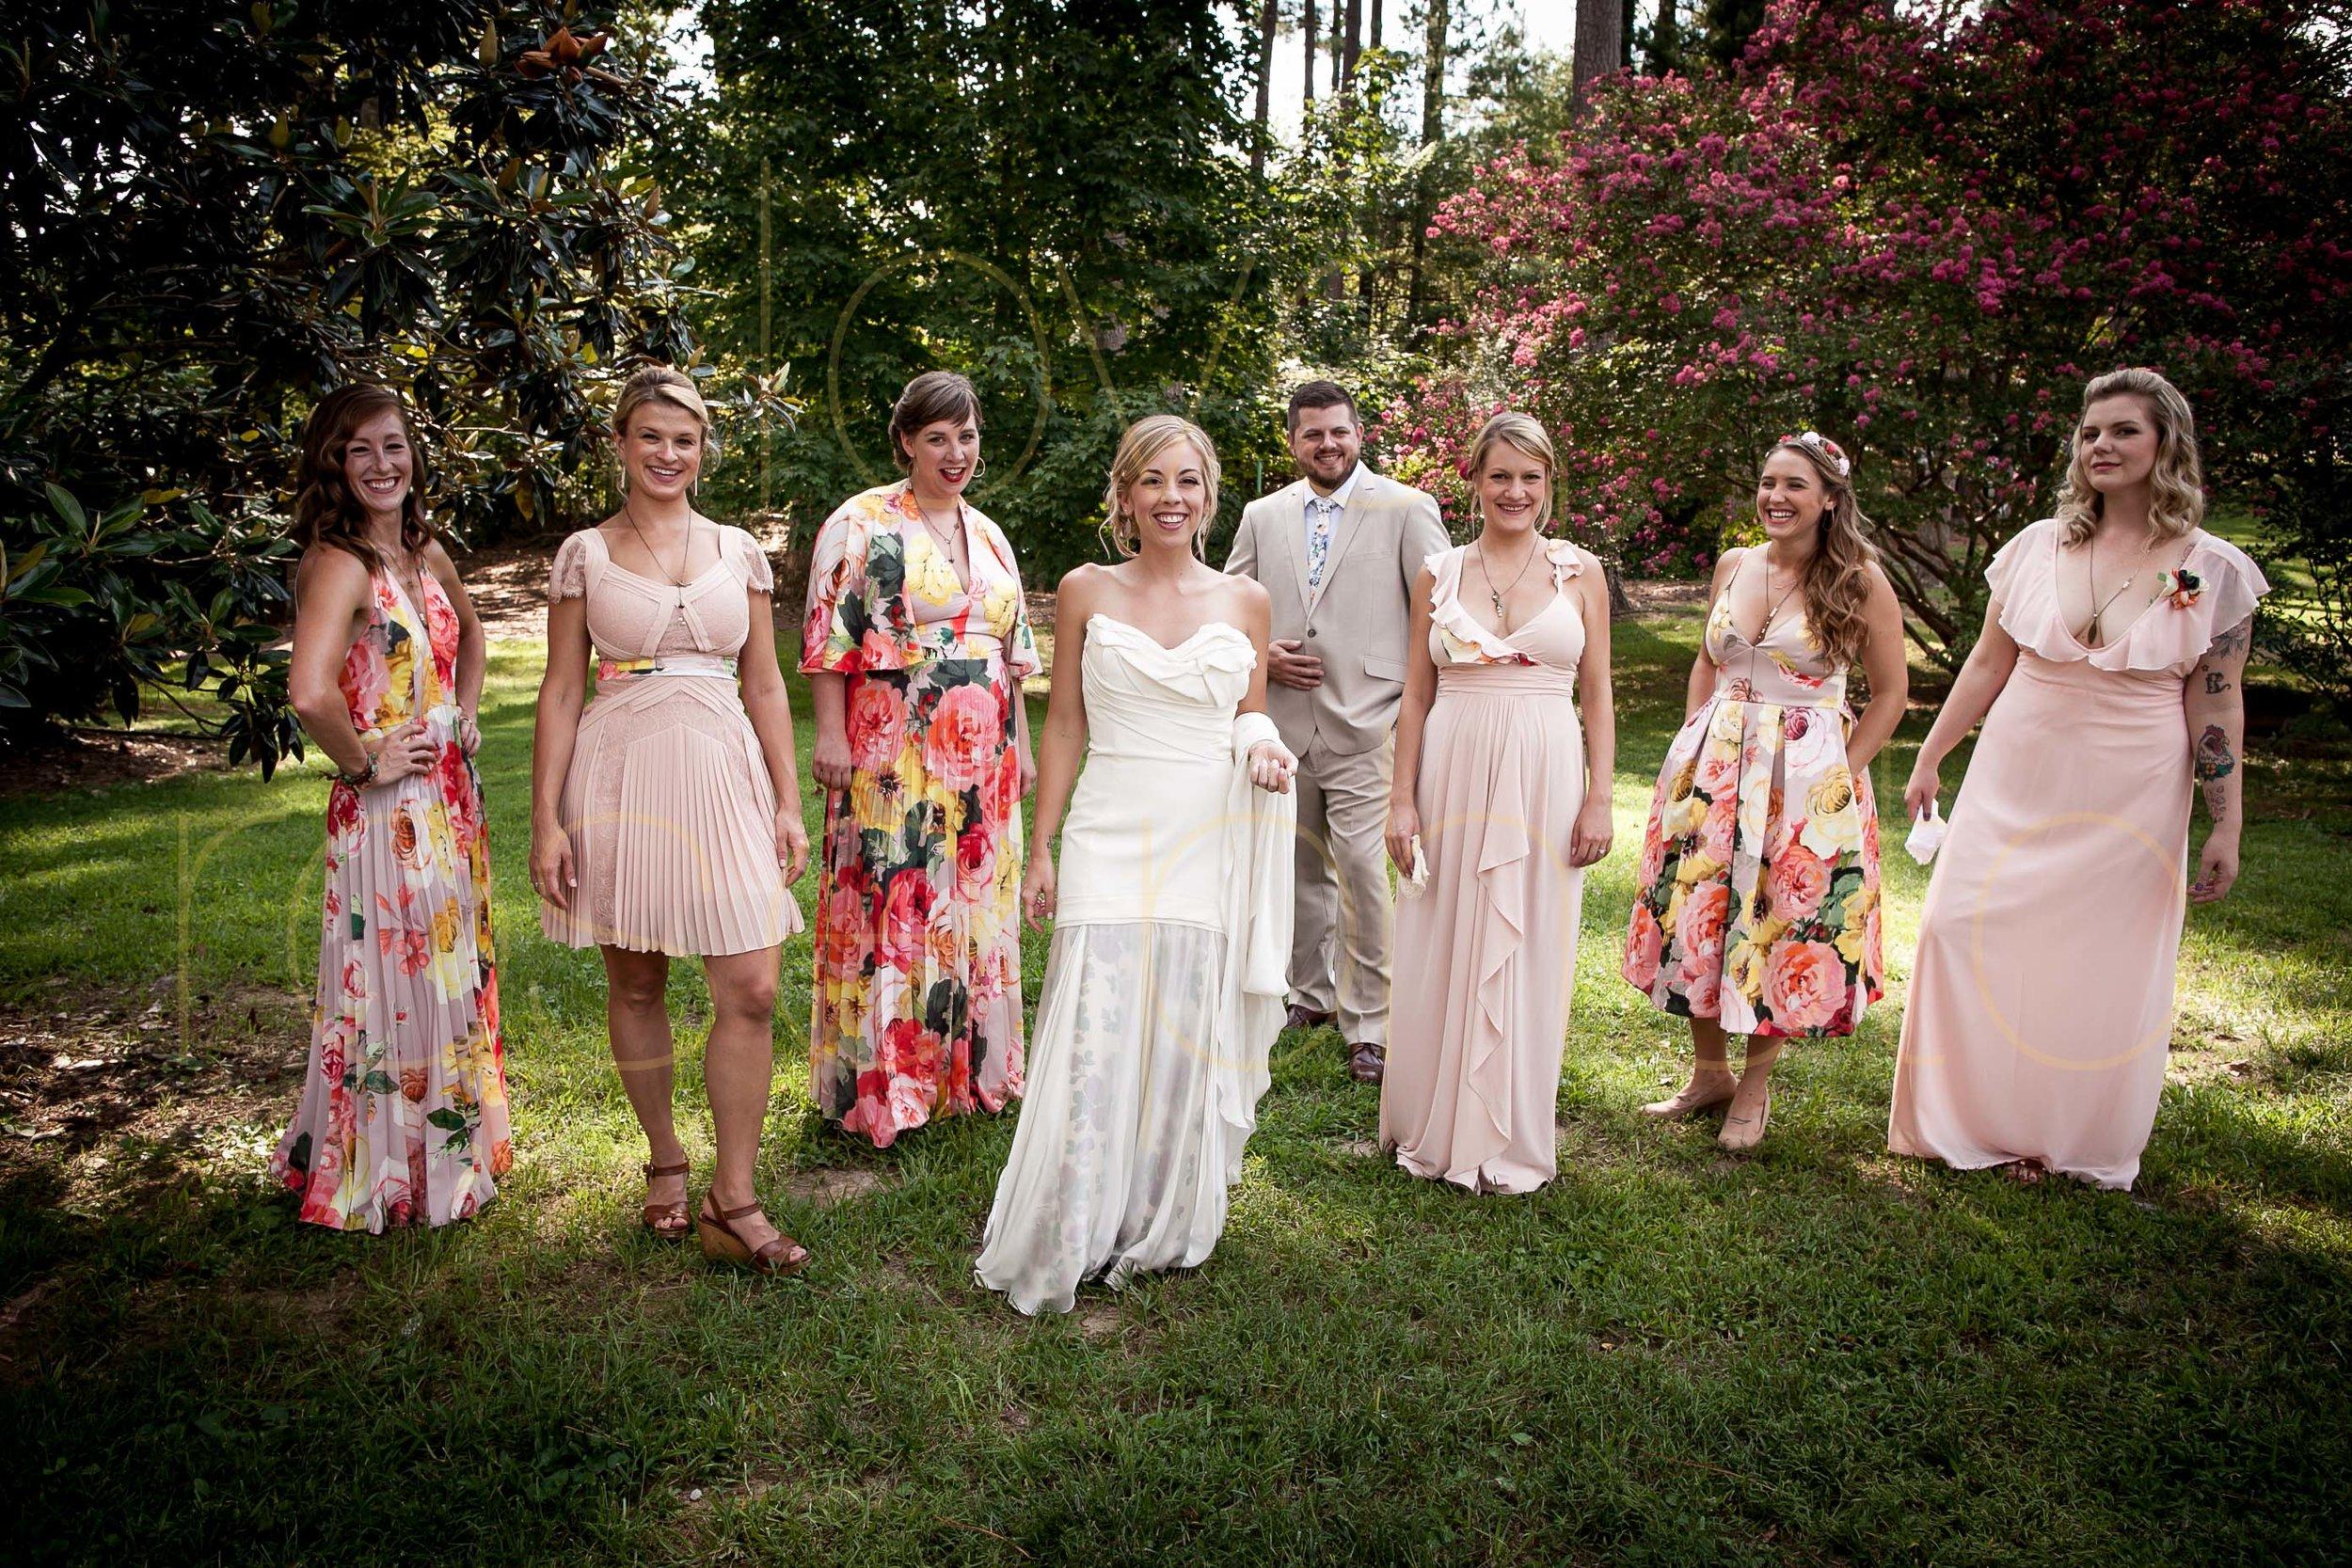 Rose Photo Asheville Wedding Photographer Nasheville Weddings Charleston Bride Chicago photojournalist weddings -19.jpg